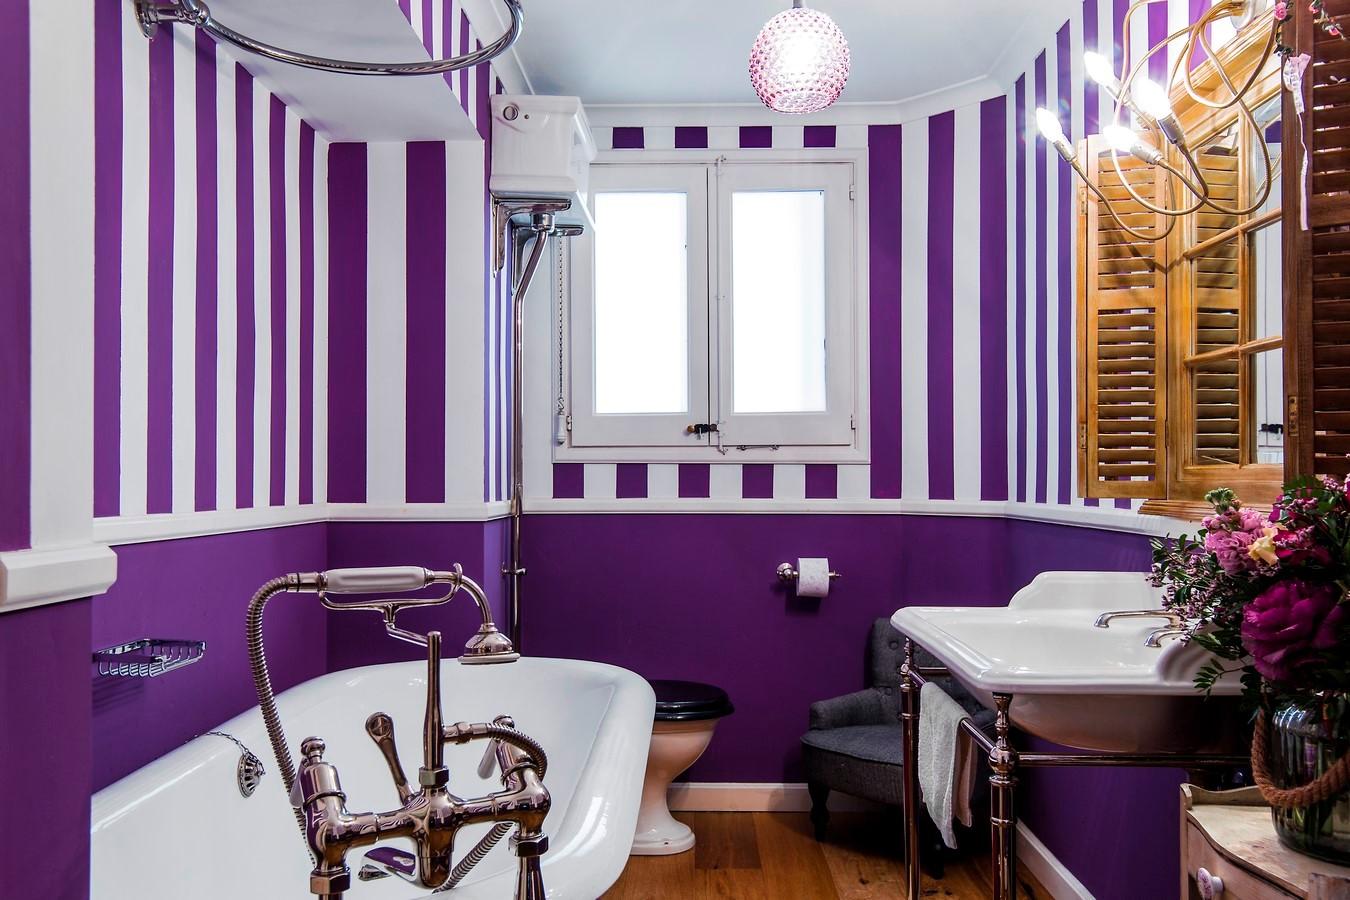 Pau Casals Apartment by Ana Engelhorn Interior Design Ltd - Sheet3